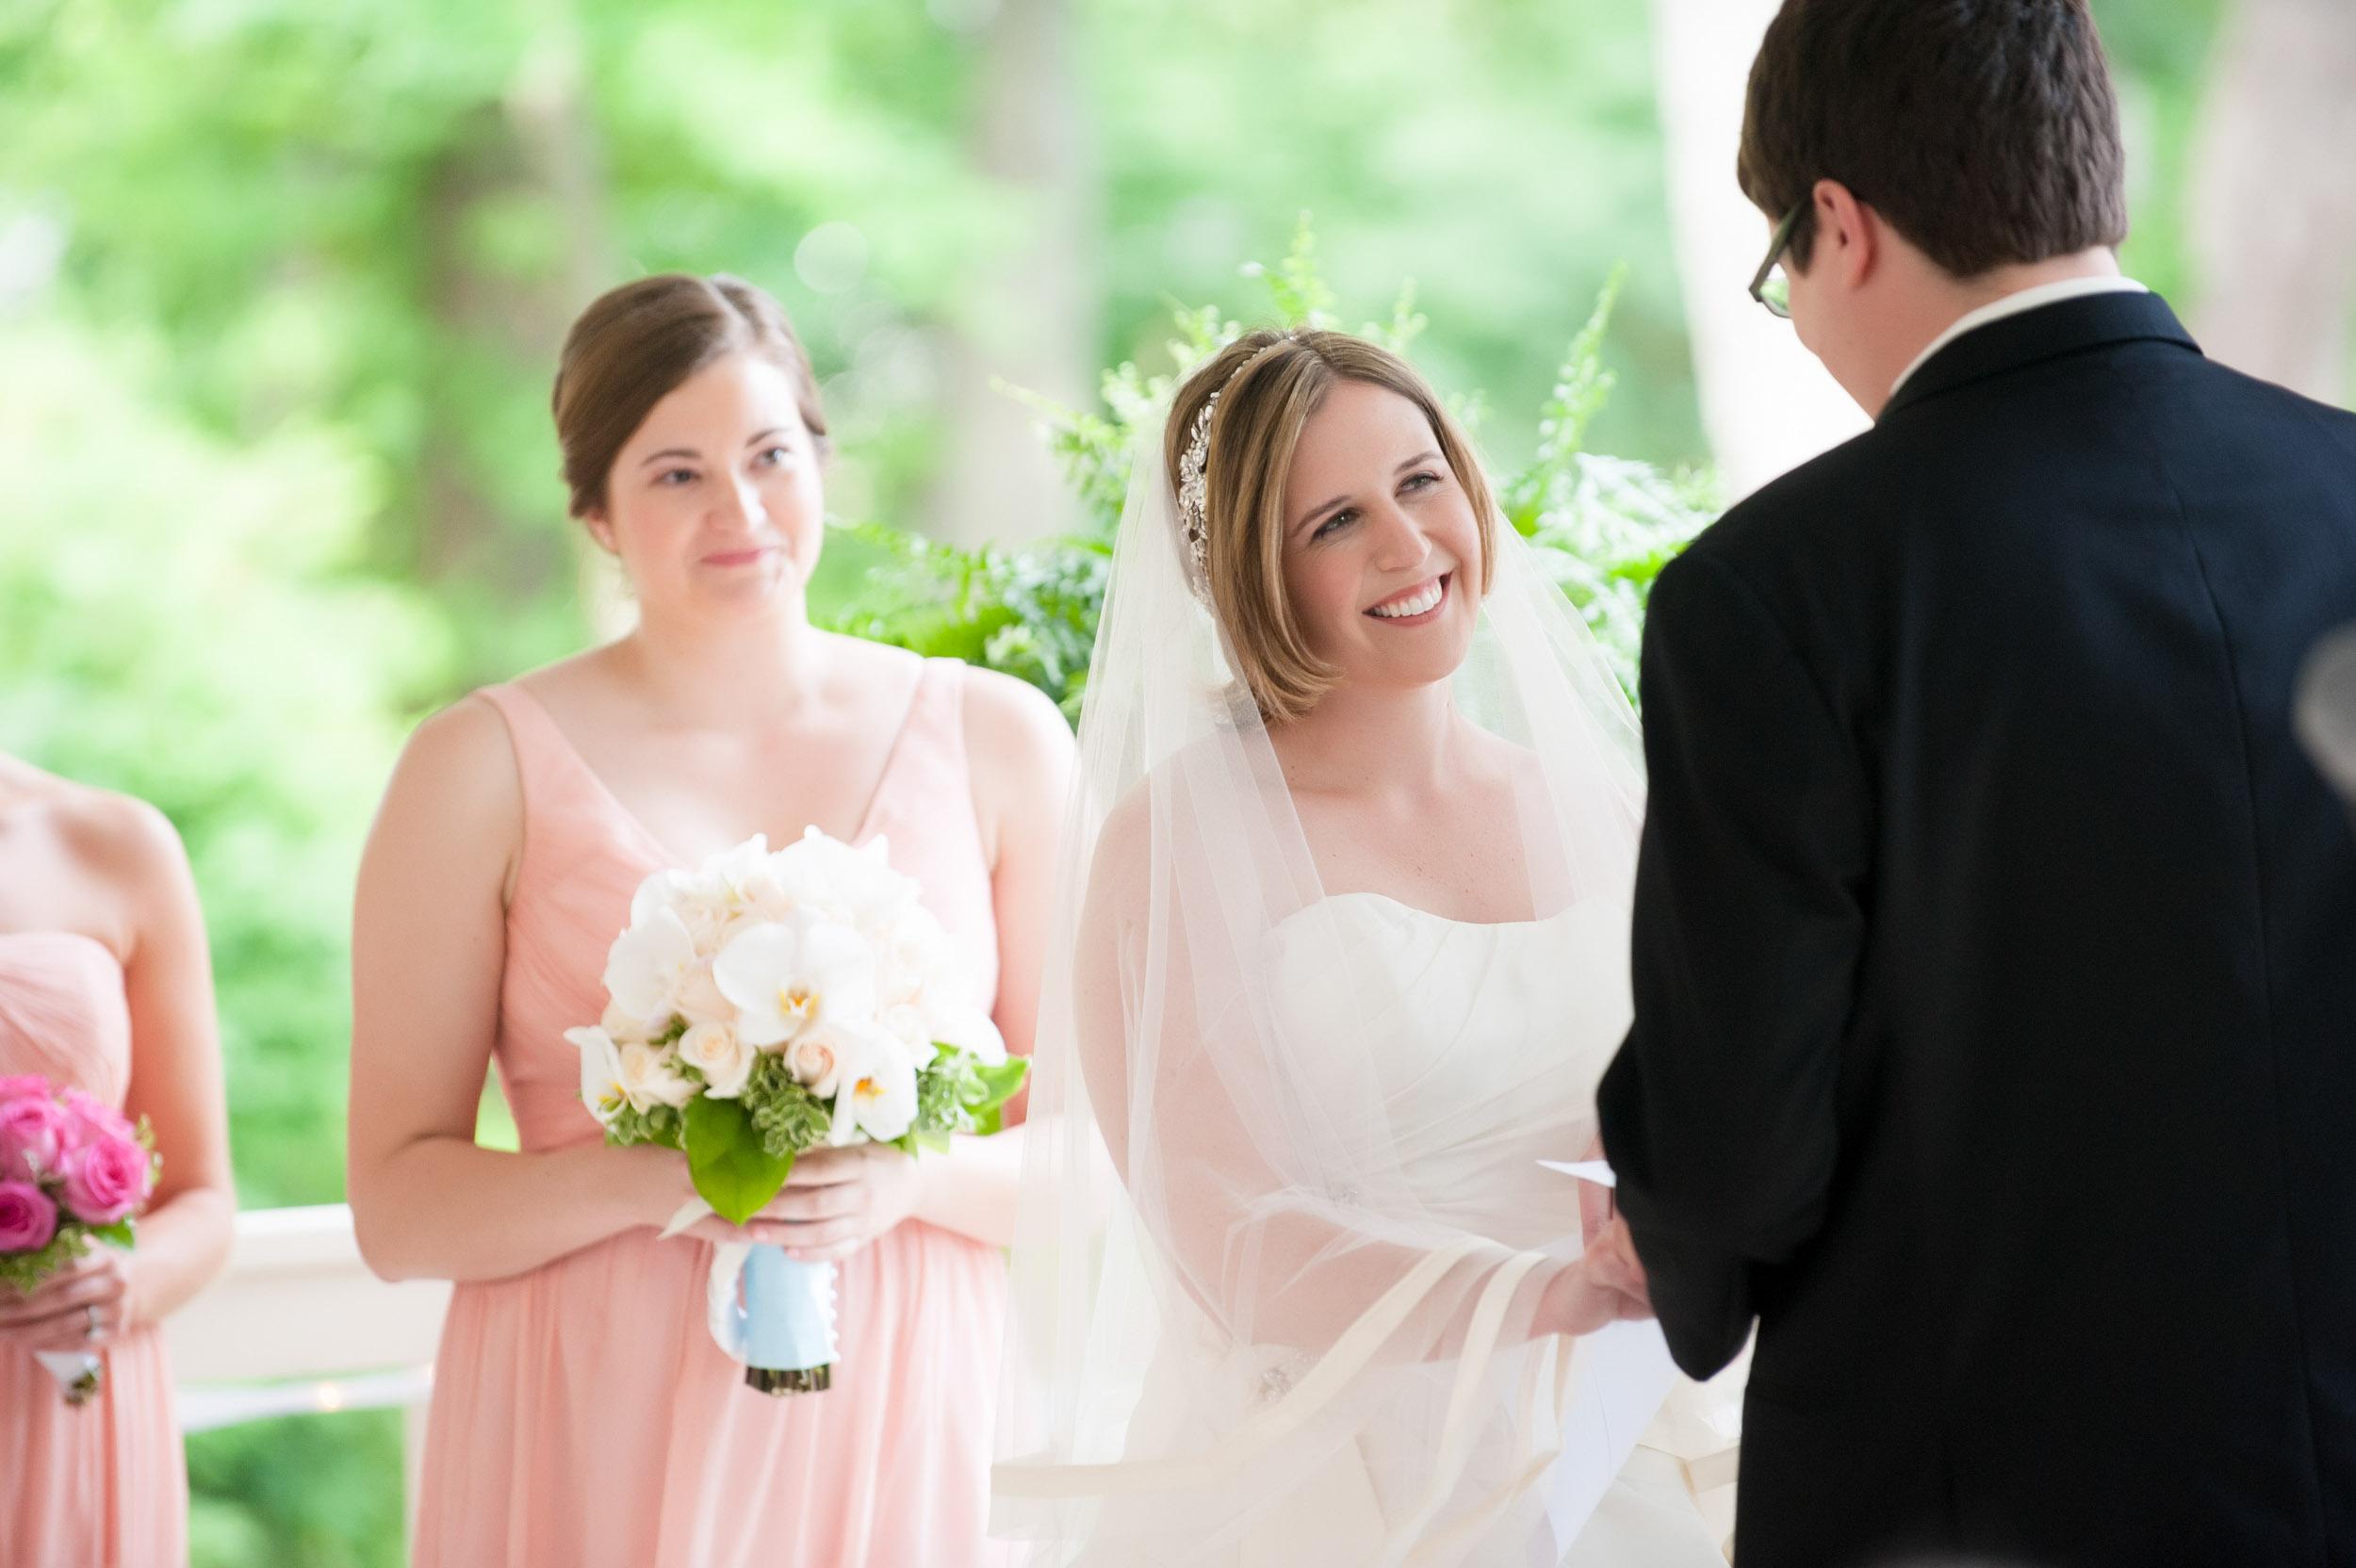 Wedding87KateTim 374*2-Edit-2.jpg